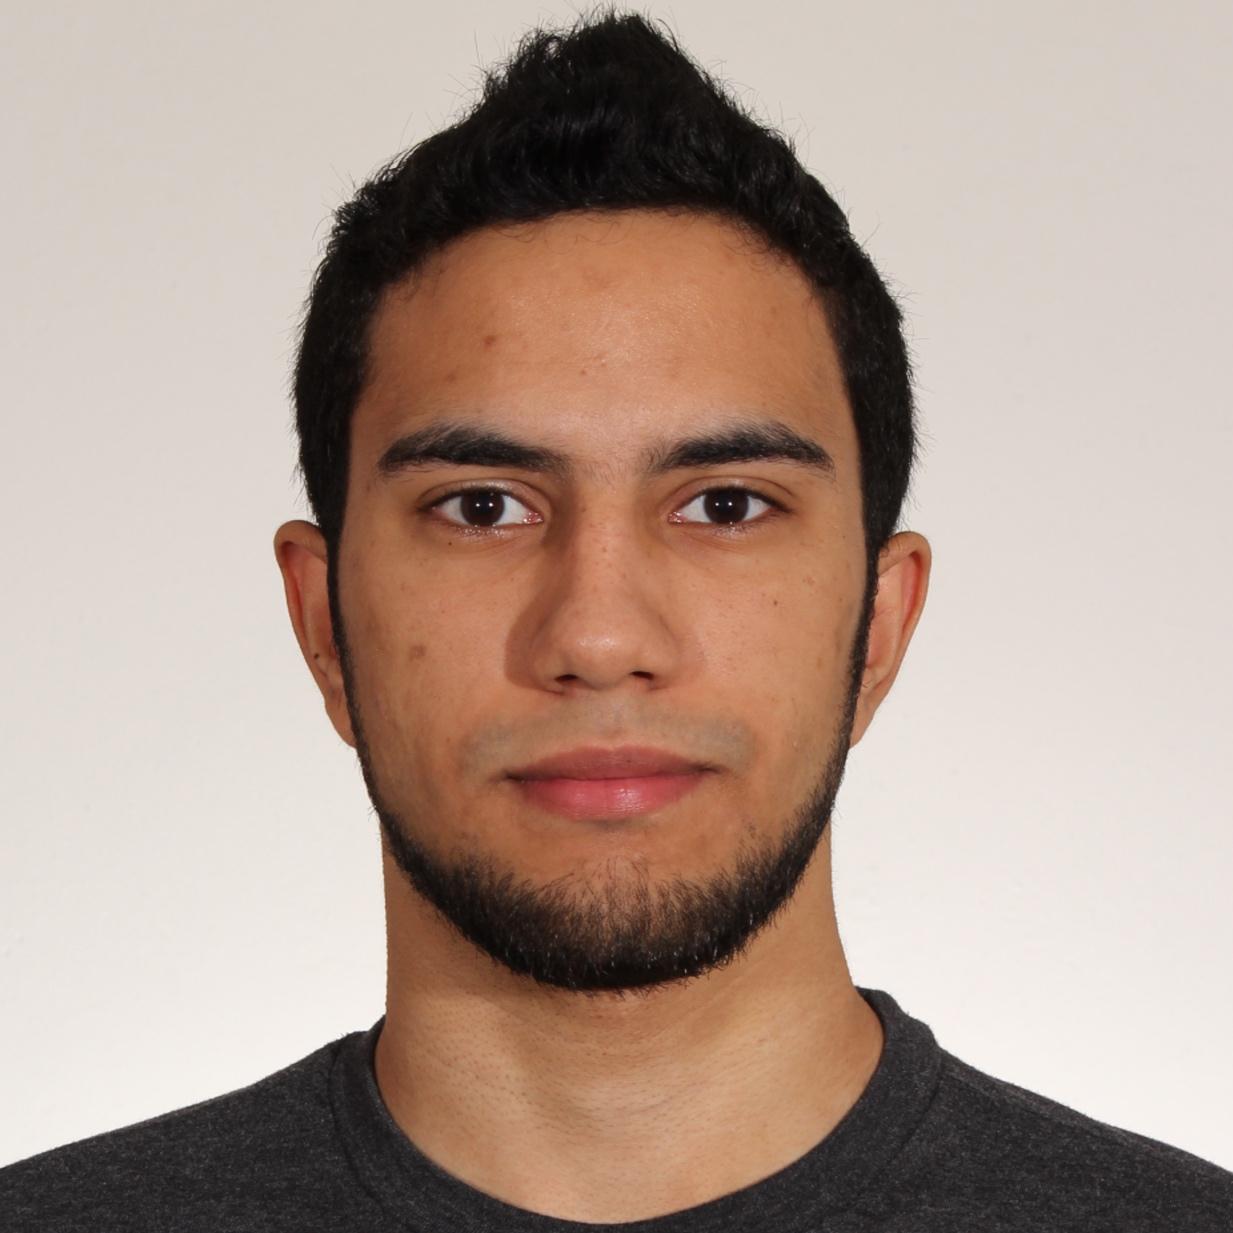 Humberto Couplr App founder